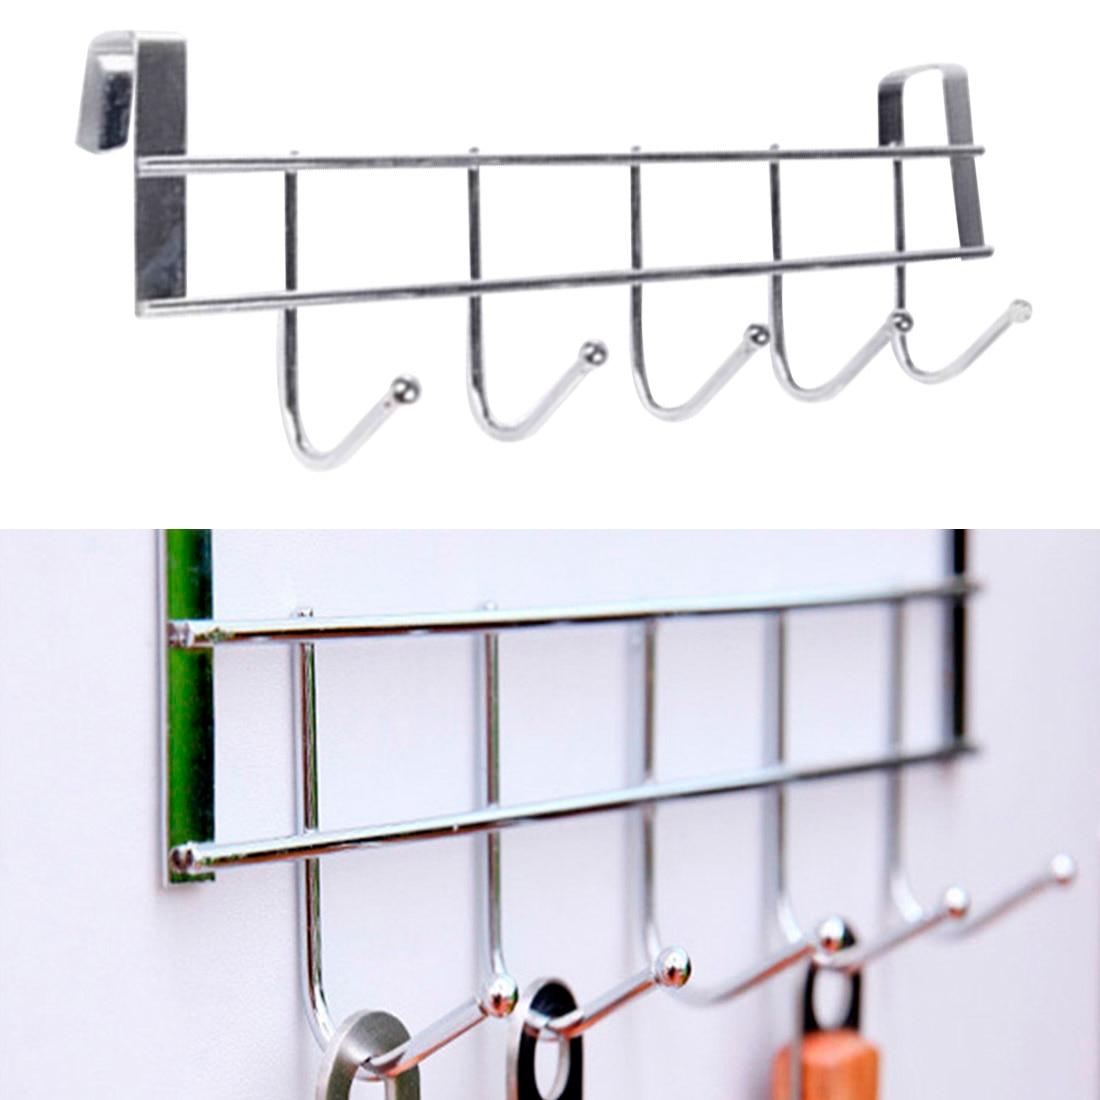 Cupboard Shelf Hanging Hook Organizer Closet Clothes Glass Mug Shelf Hanger Wardrobe Holder Kitchen Cupboard Storage Rack